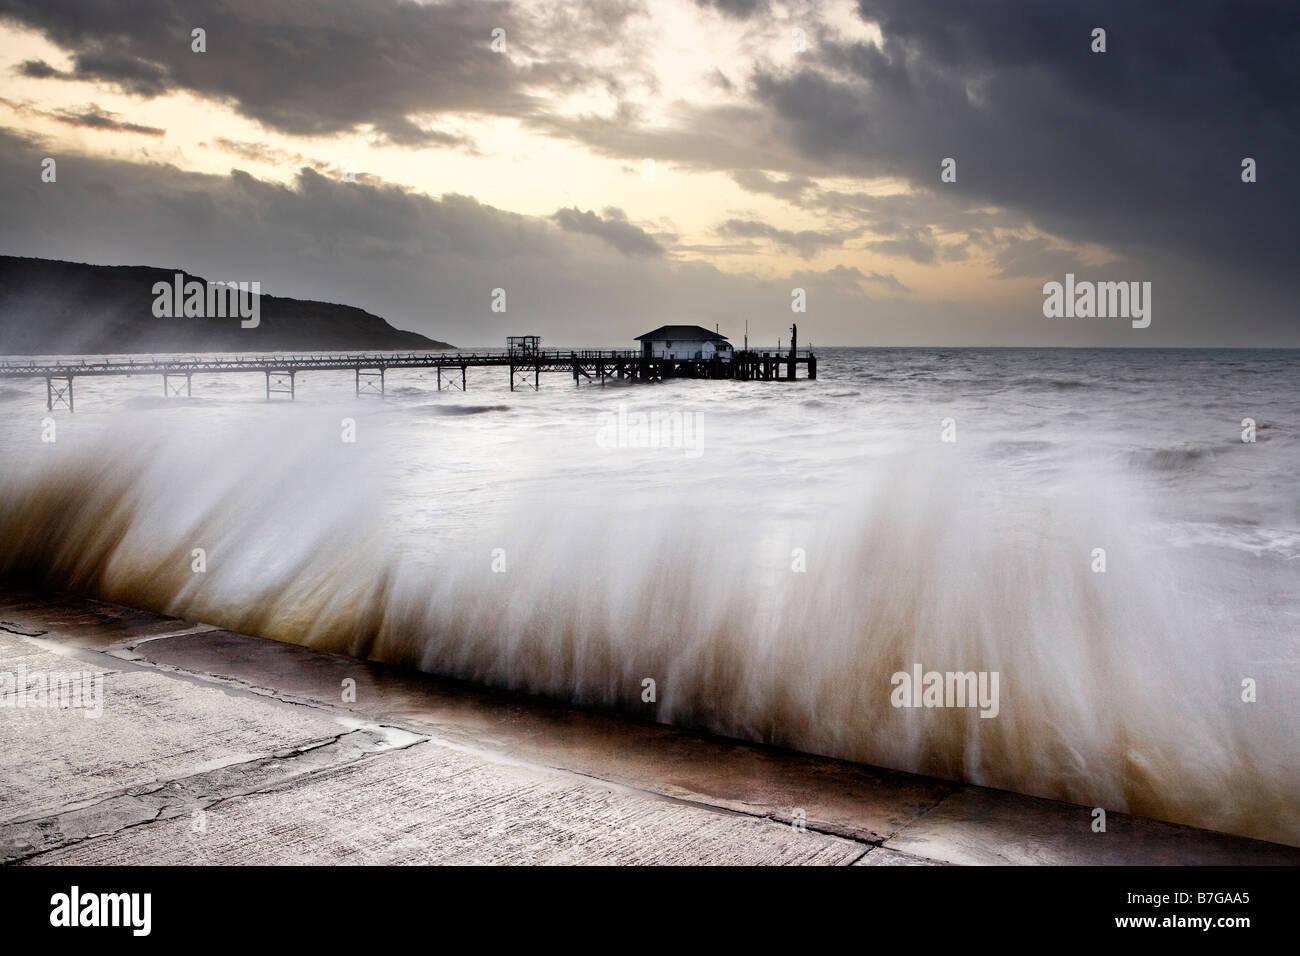 Mer forte à Totland Bay, île de Wight Photo Stock